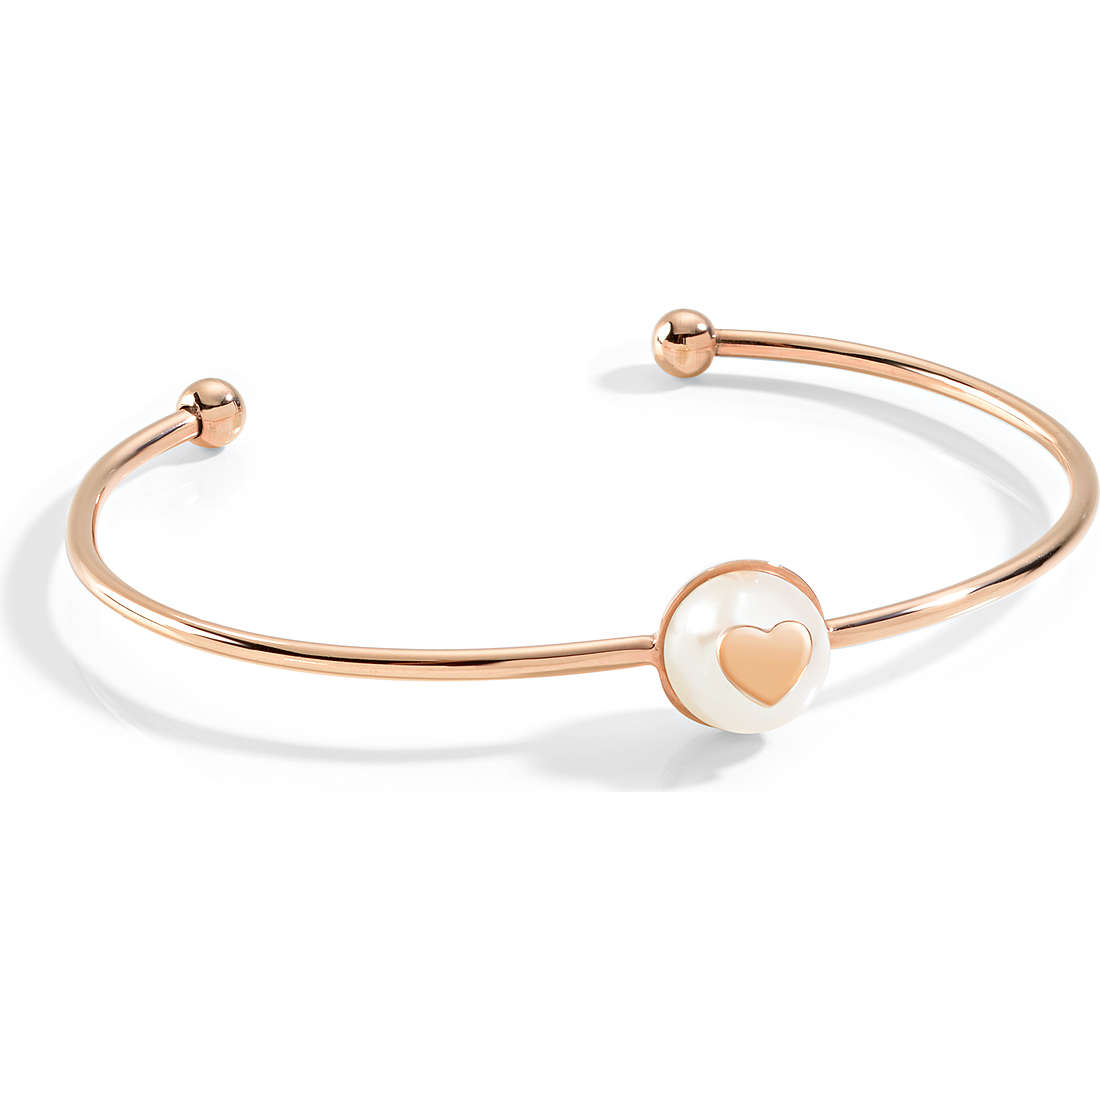 bracelet woman jewellery Morellato Le chicche SACQ05